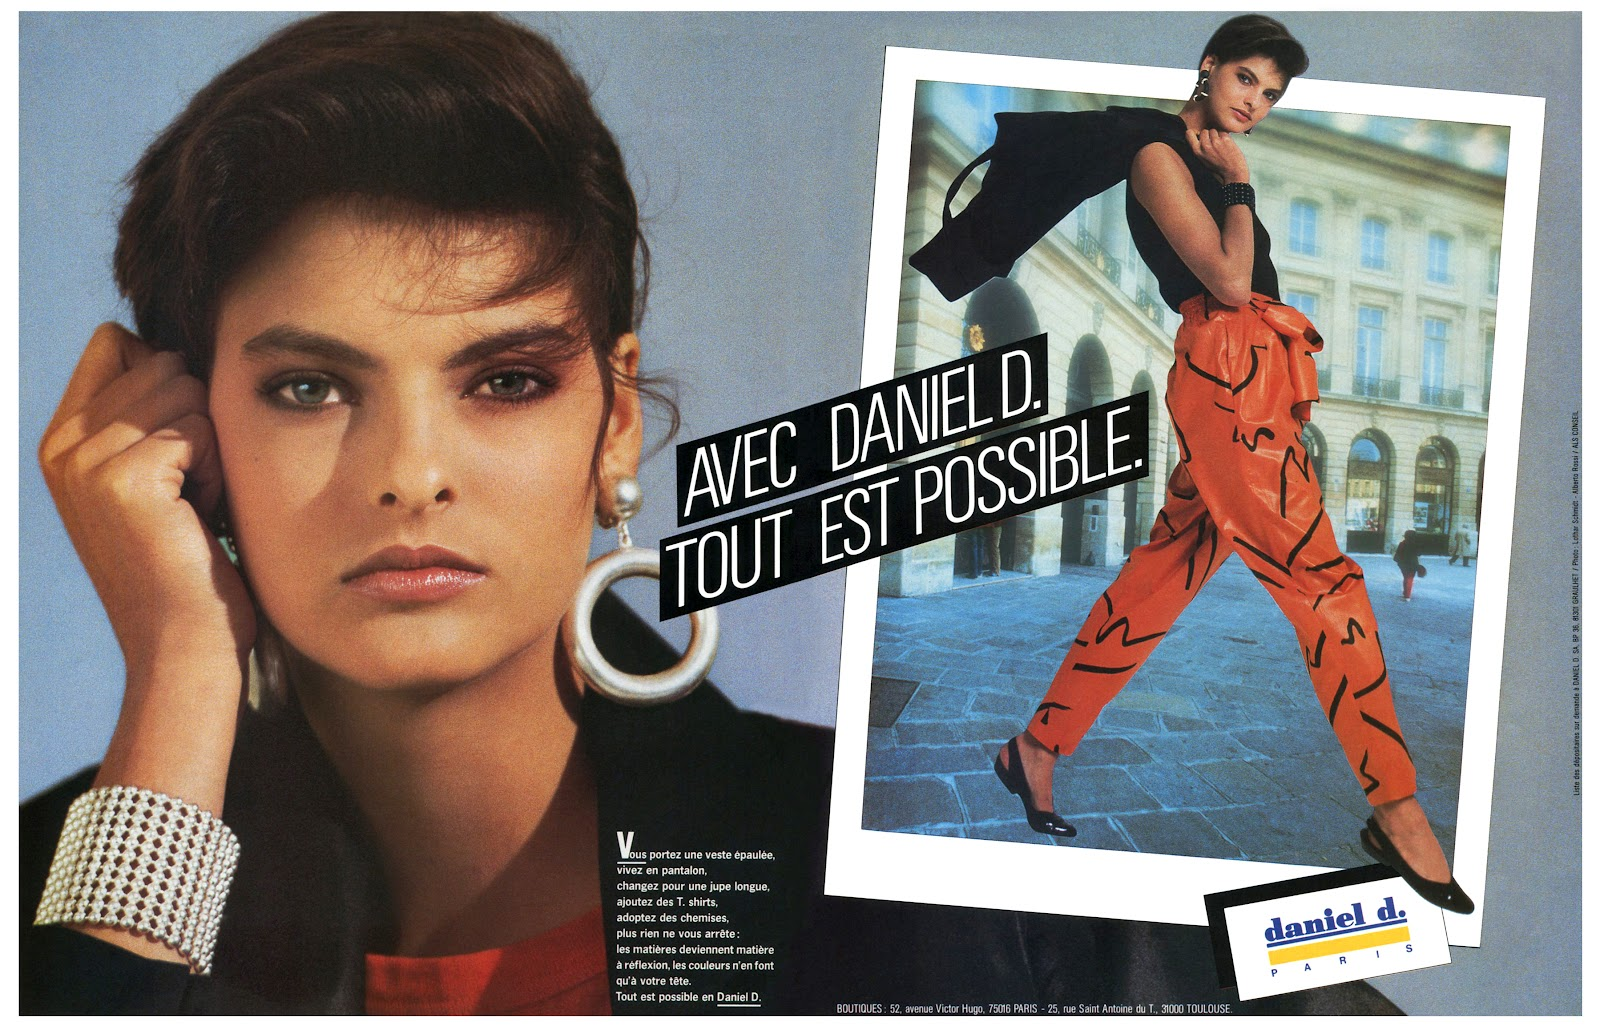 http://3.bp.blogspot.com/-Ix7AYc1Ng2I/T2YRgKWerYI/AAAAAAAAFDU/1iVSMgaykMs/s1600/Linda+Evangelista+1985+SS+Daniel+D+Ph+Lothar+Schmidt+Alberto+Rossi+001.jpg